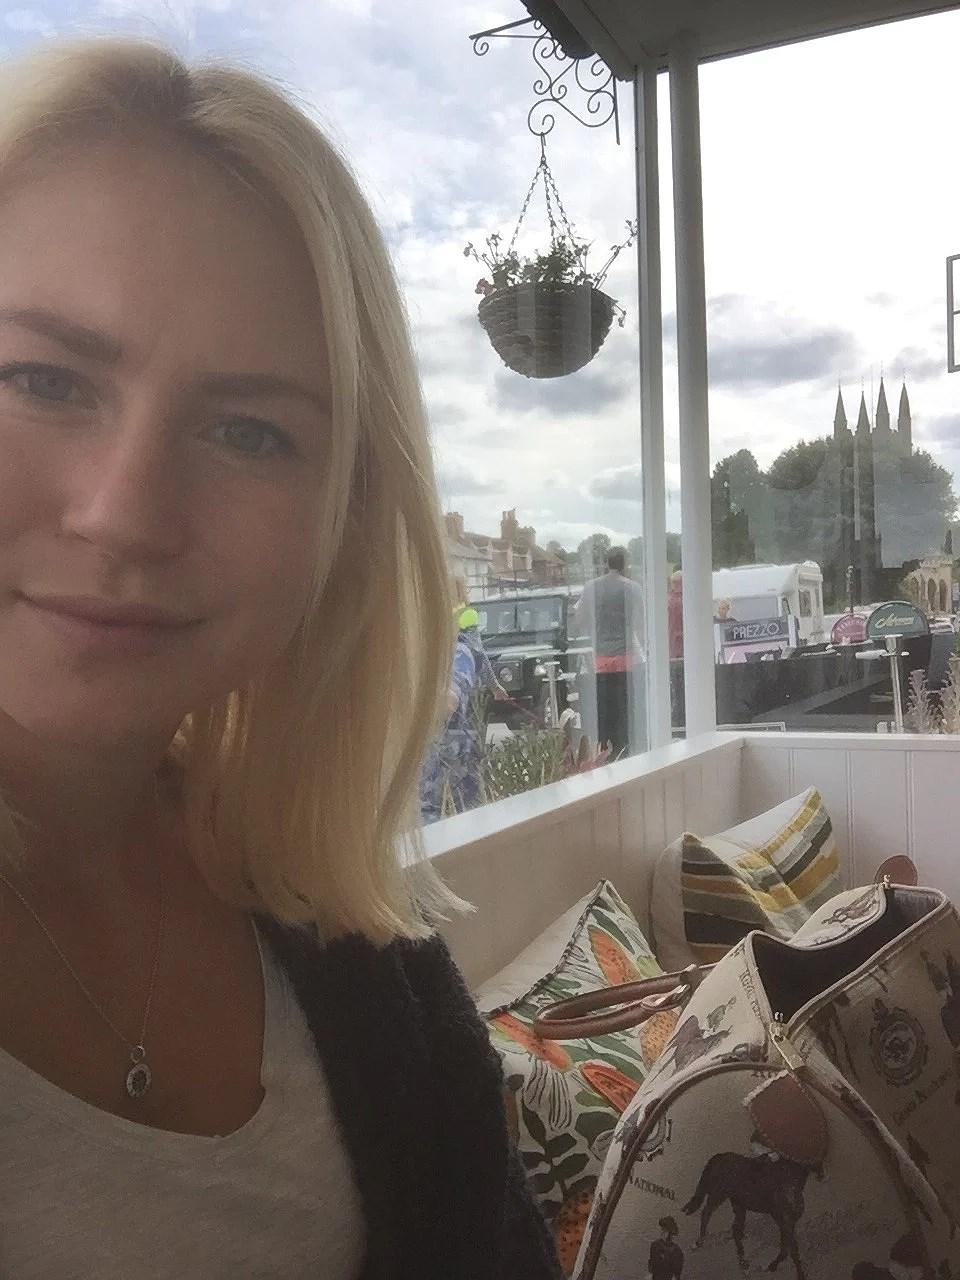 vloggfilmning, nyklippt och kafemys